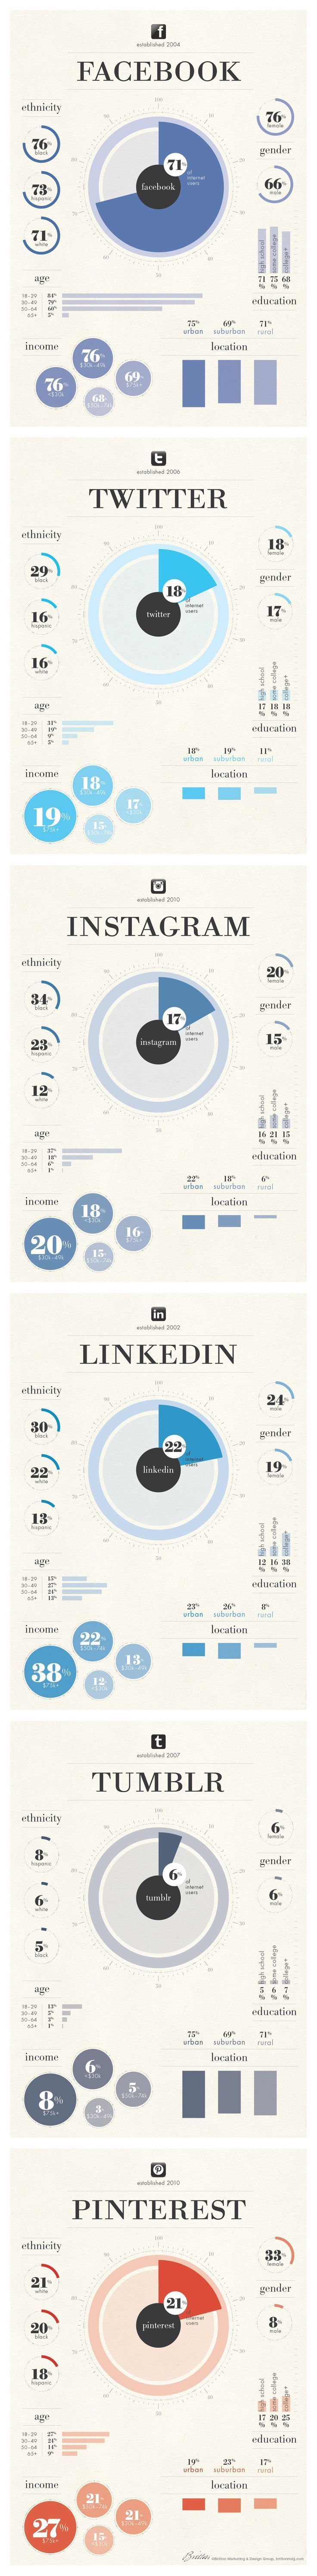 #SocialMedia 2014: User Demographics For Facebook, Twitter, Instagram, LinkedIn, Tumblr and #Pinterest - #infographic